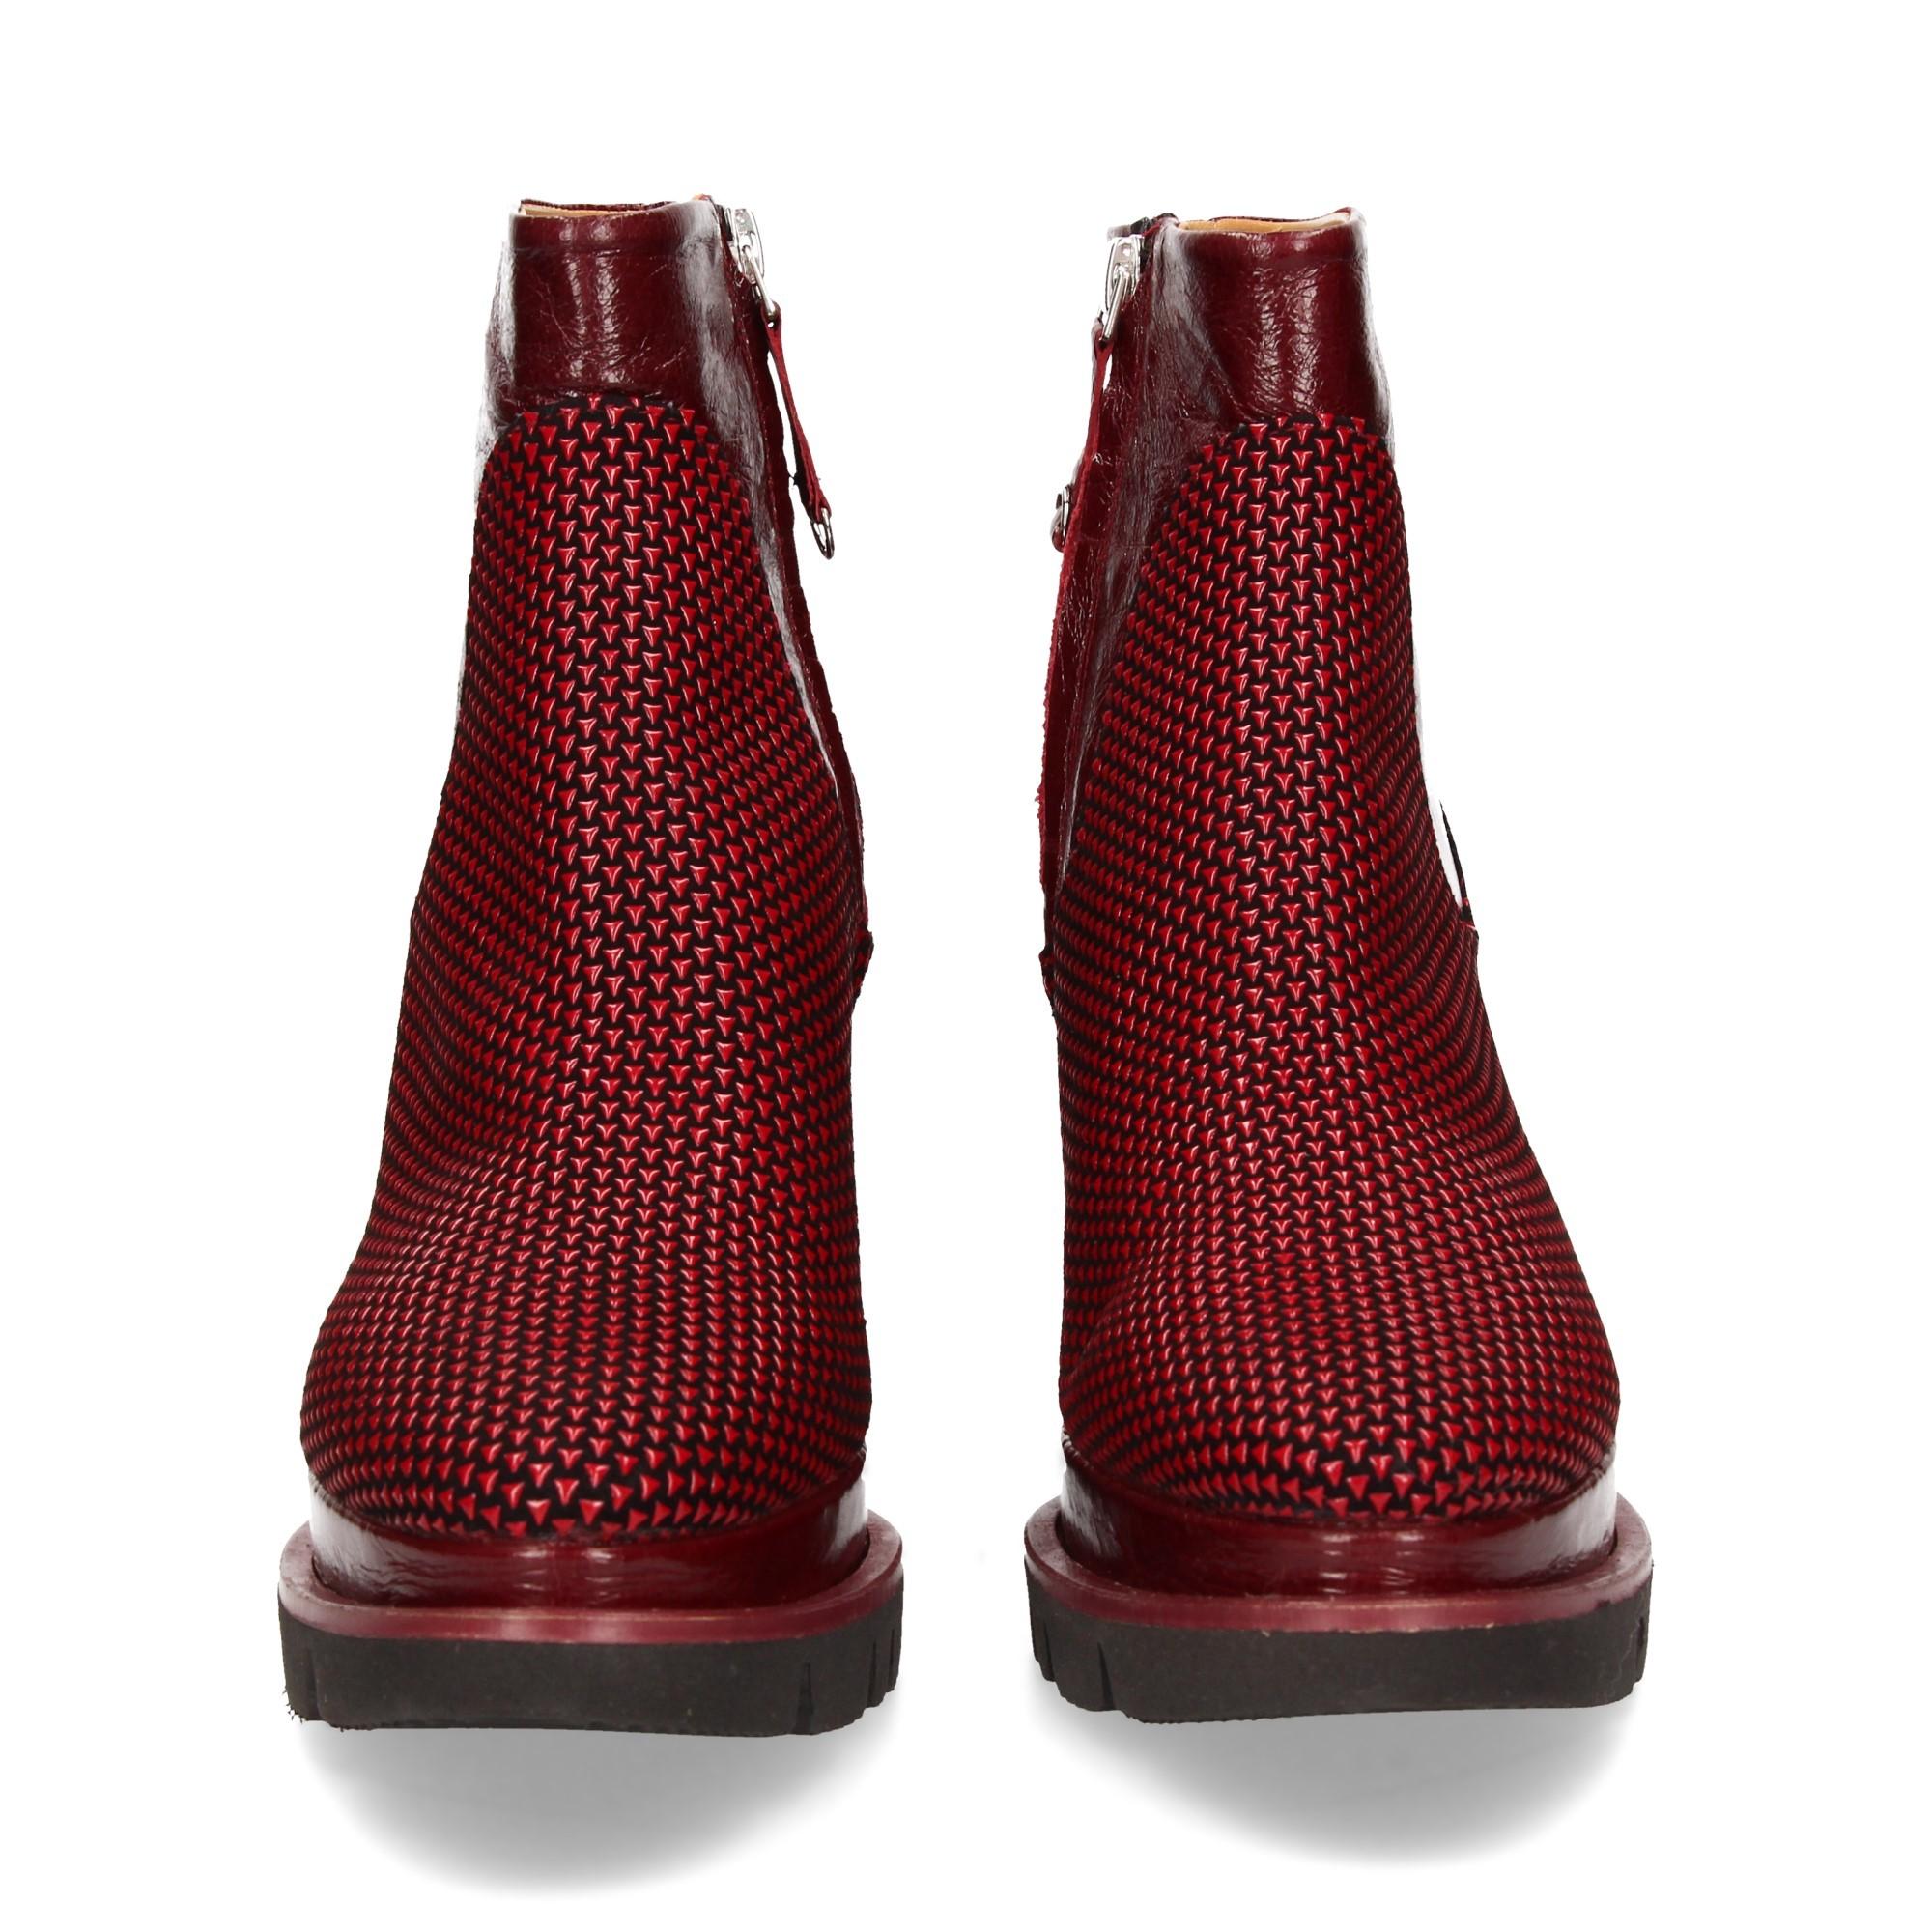 botin-cuna-elast-piel-textura-rojo